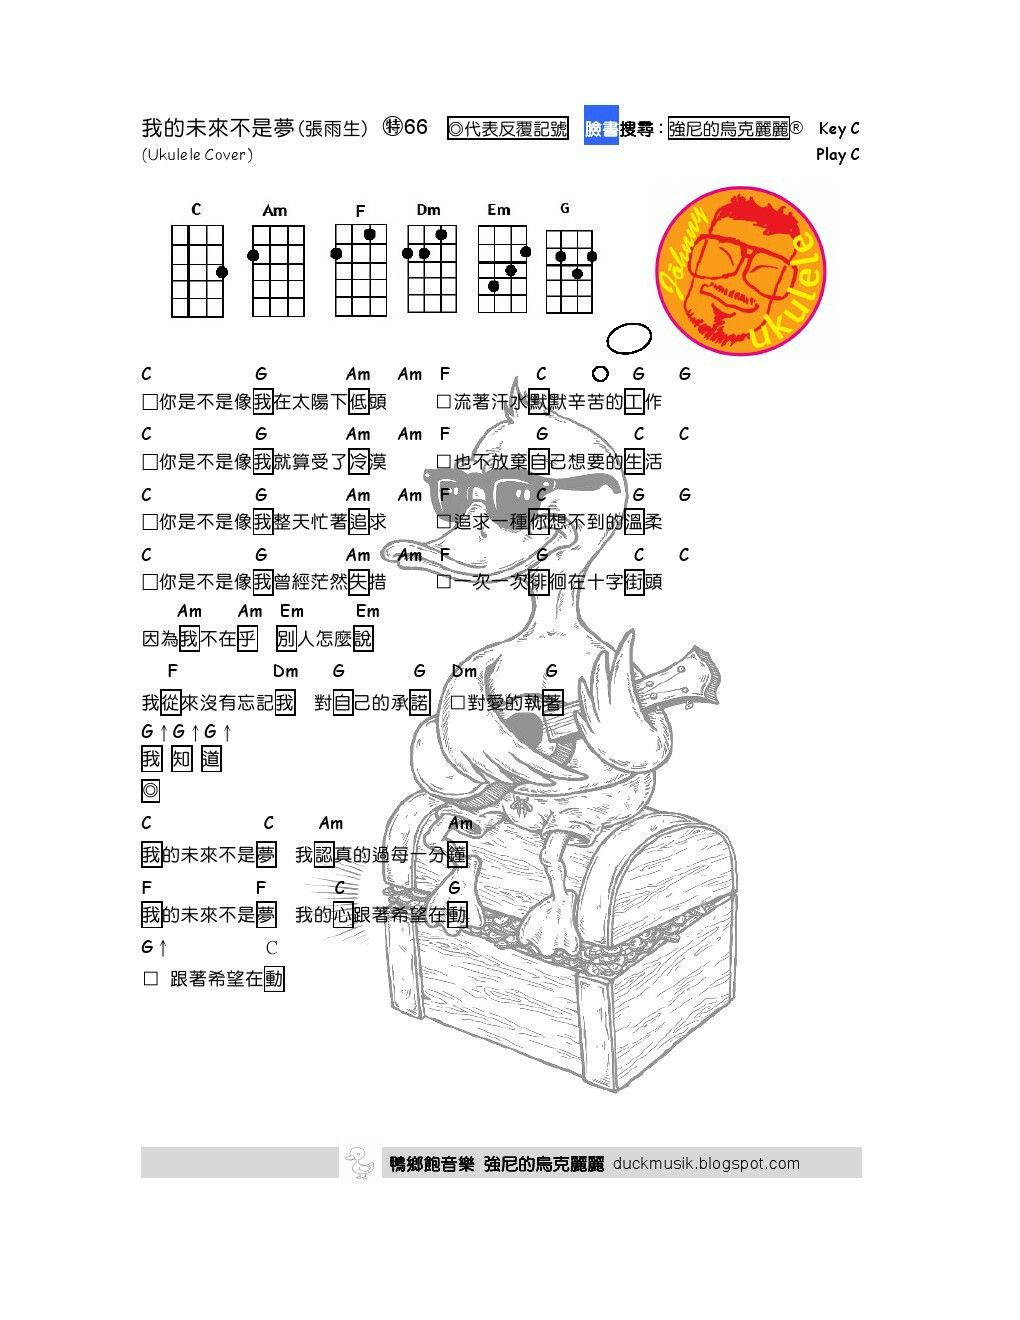 pin by verano hsuan on ukulele